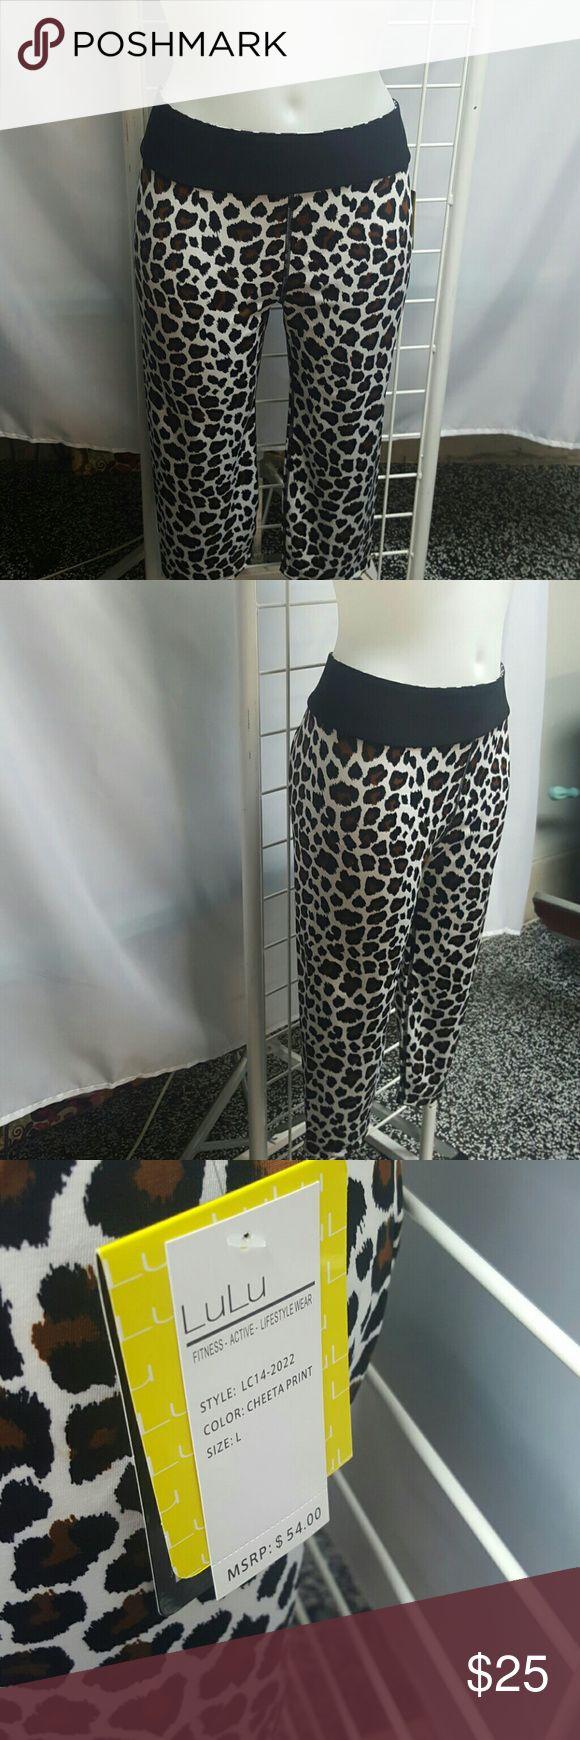 LULU CHEETAH PRINT YOGA PANTS Capri style cheetah print Lulu Pants